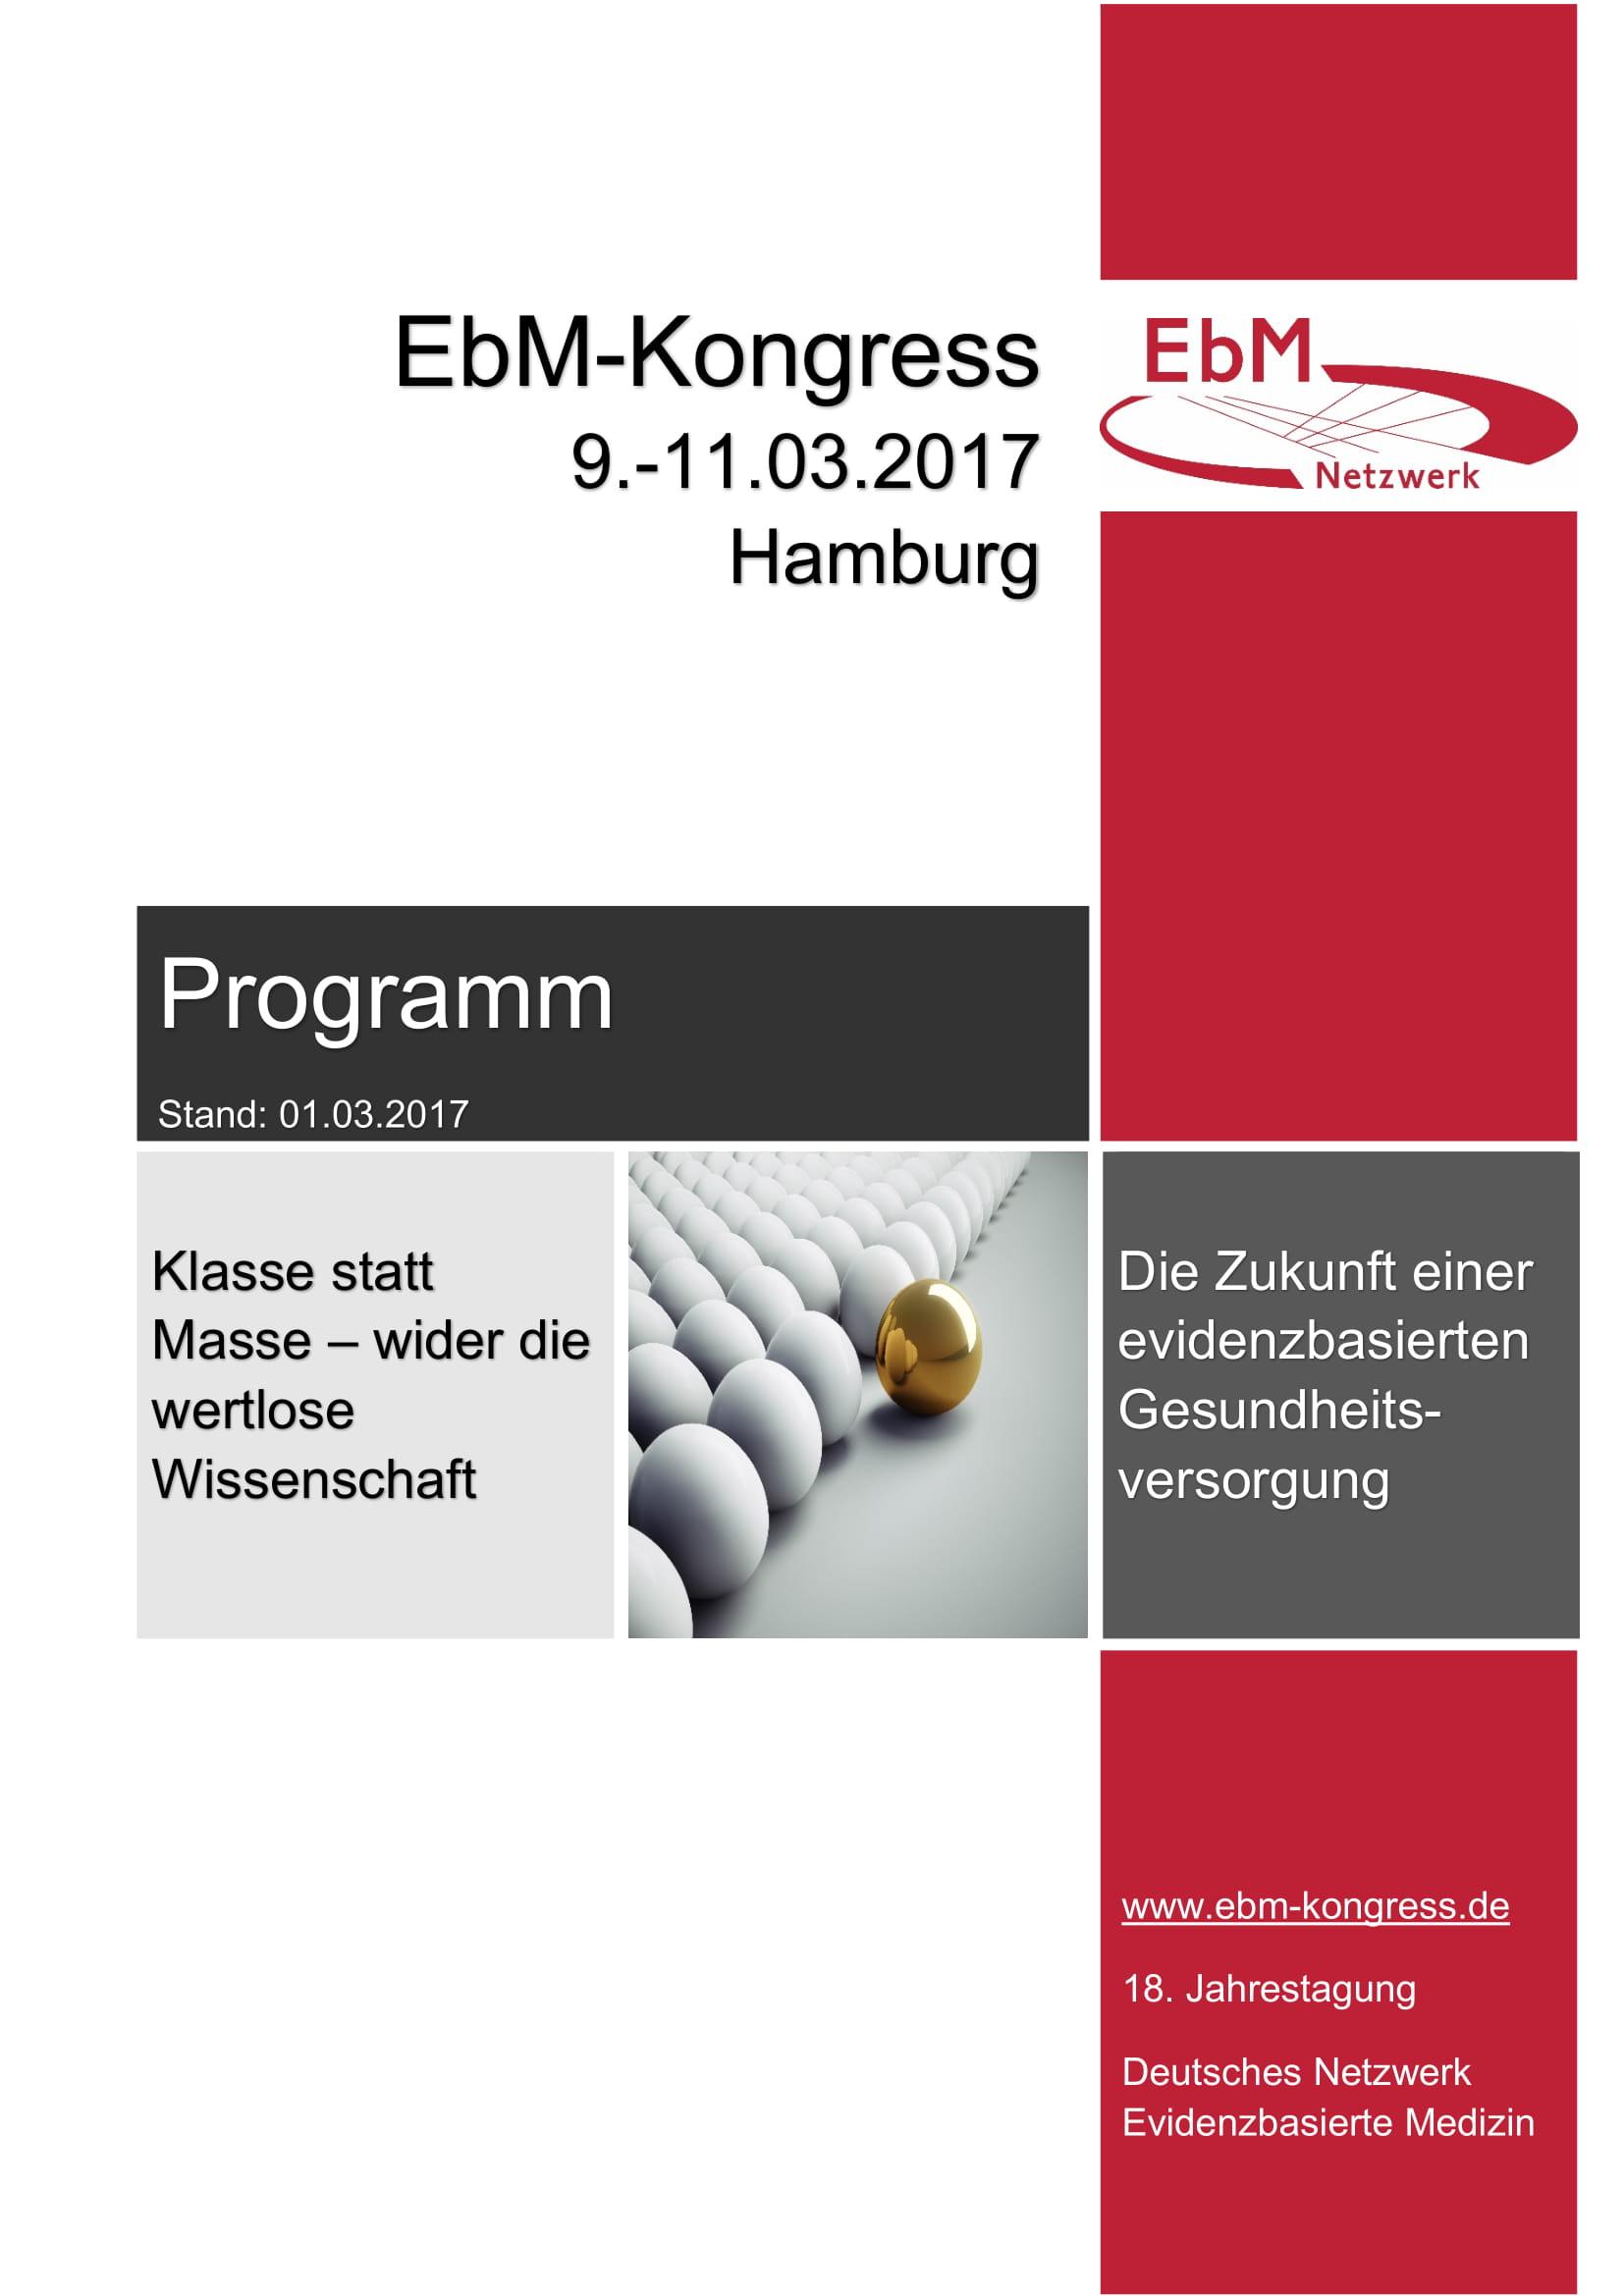 EbM2017-Programmheft-Deckblatt.jpg